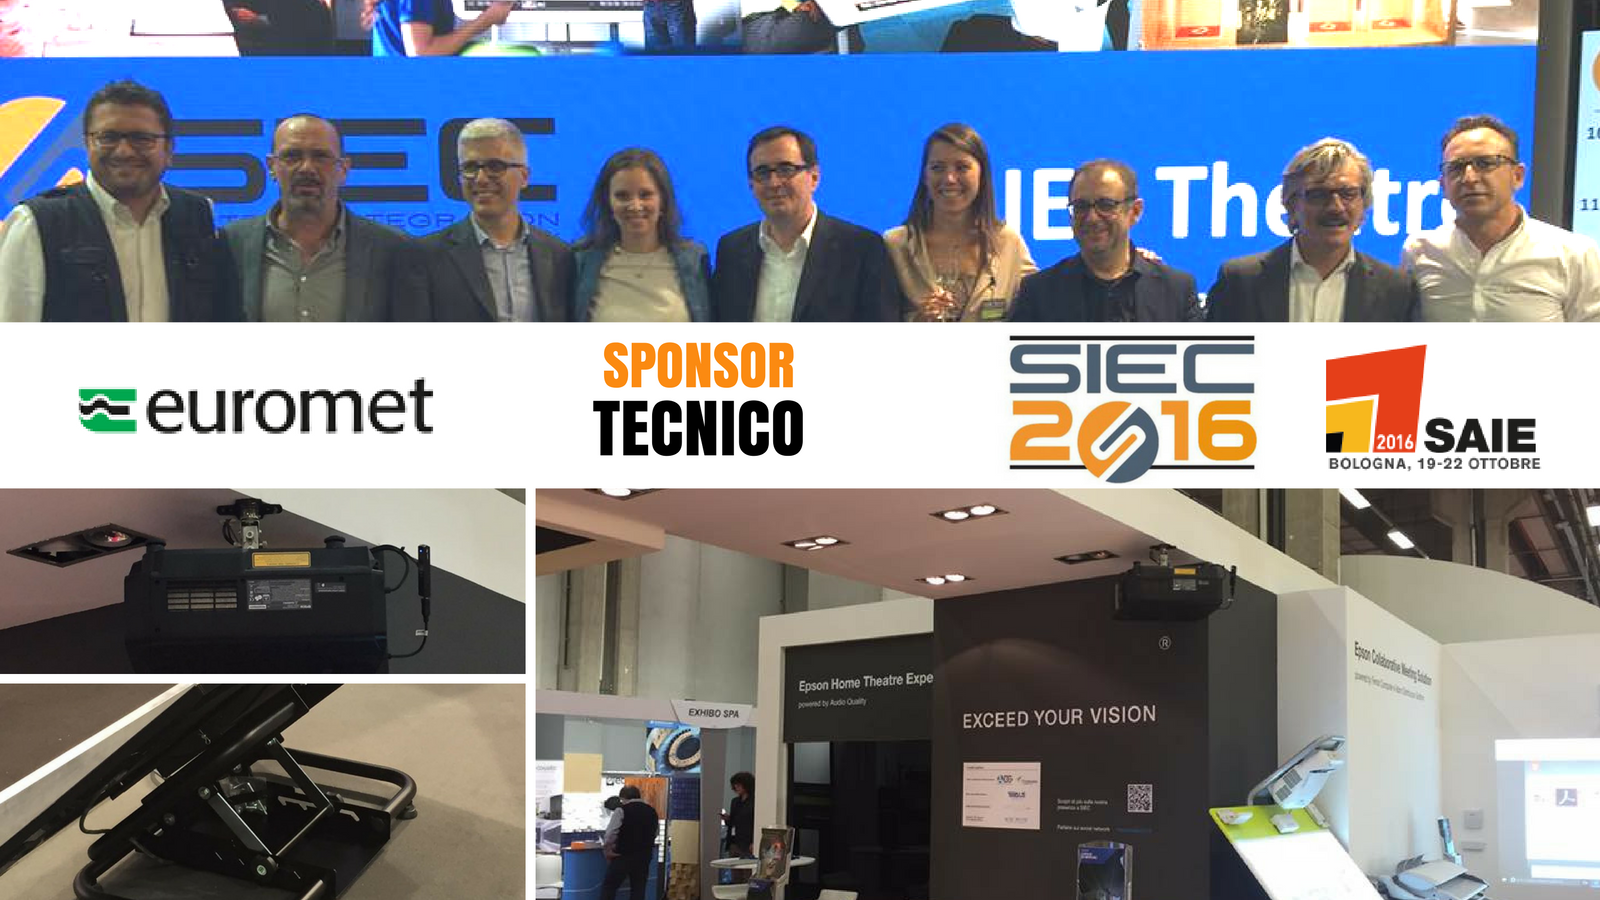 euromet-sponsor-tecnico-SIEC-2016